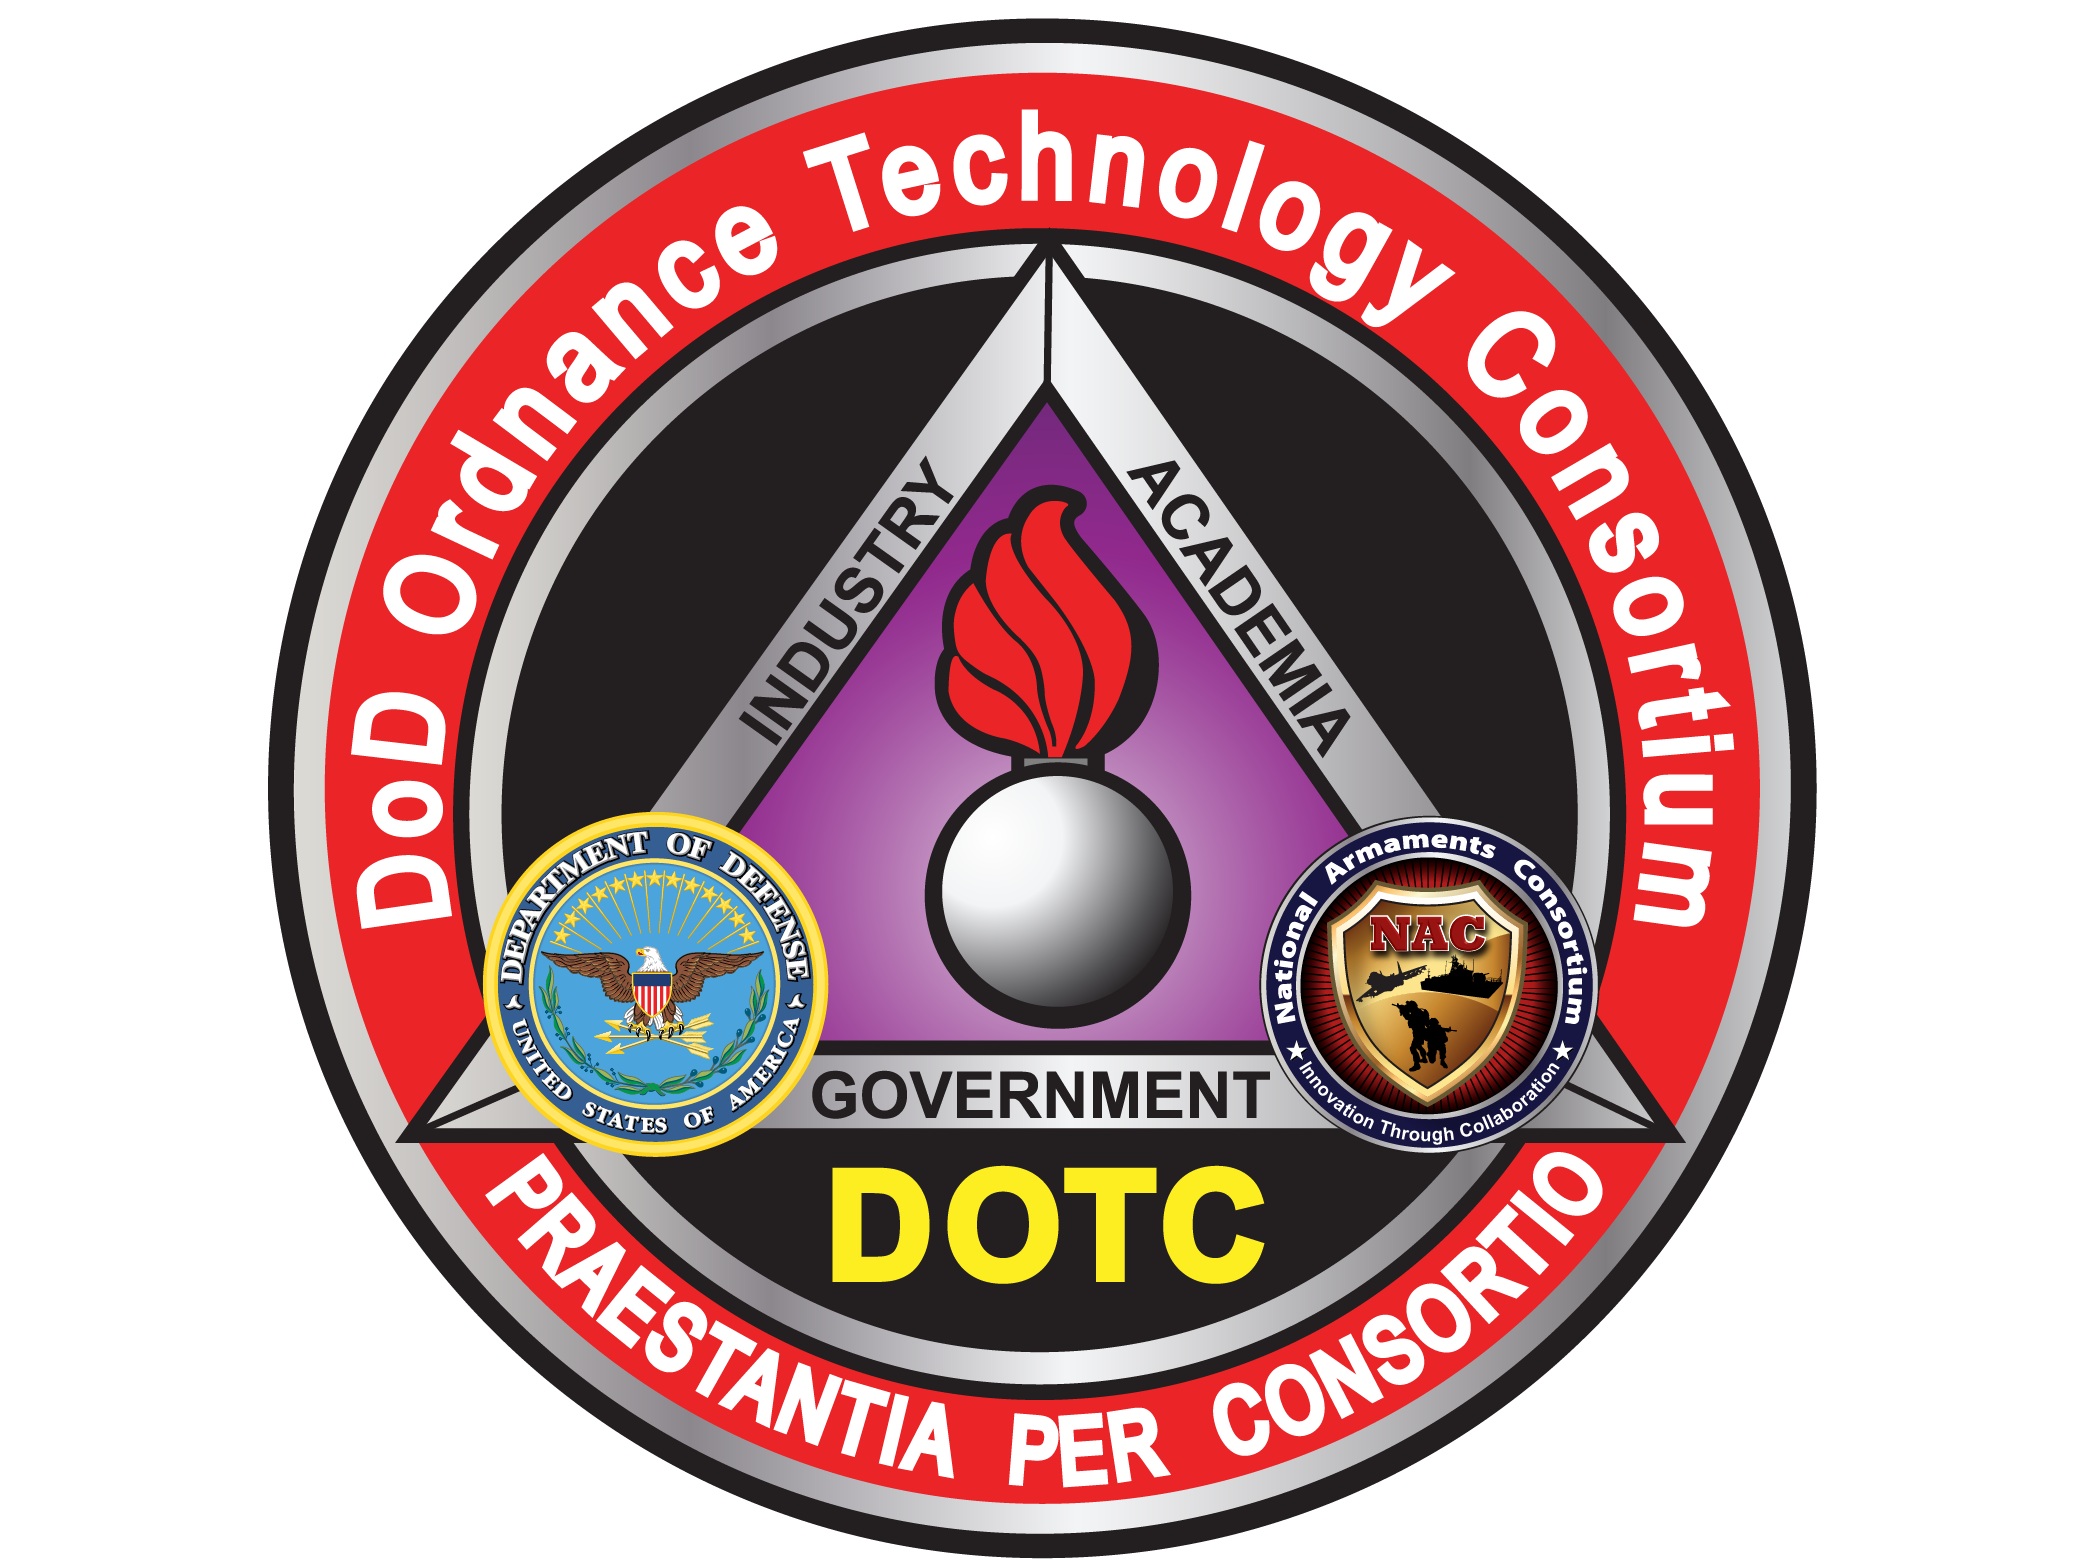 DoD Ordnance Technology Consortium (DOTC)